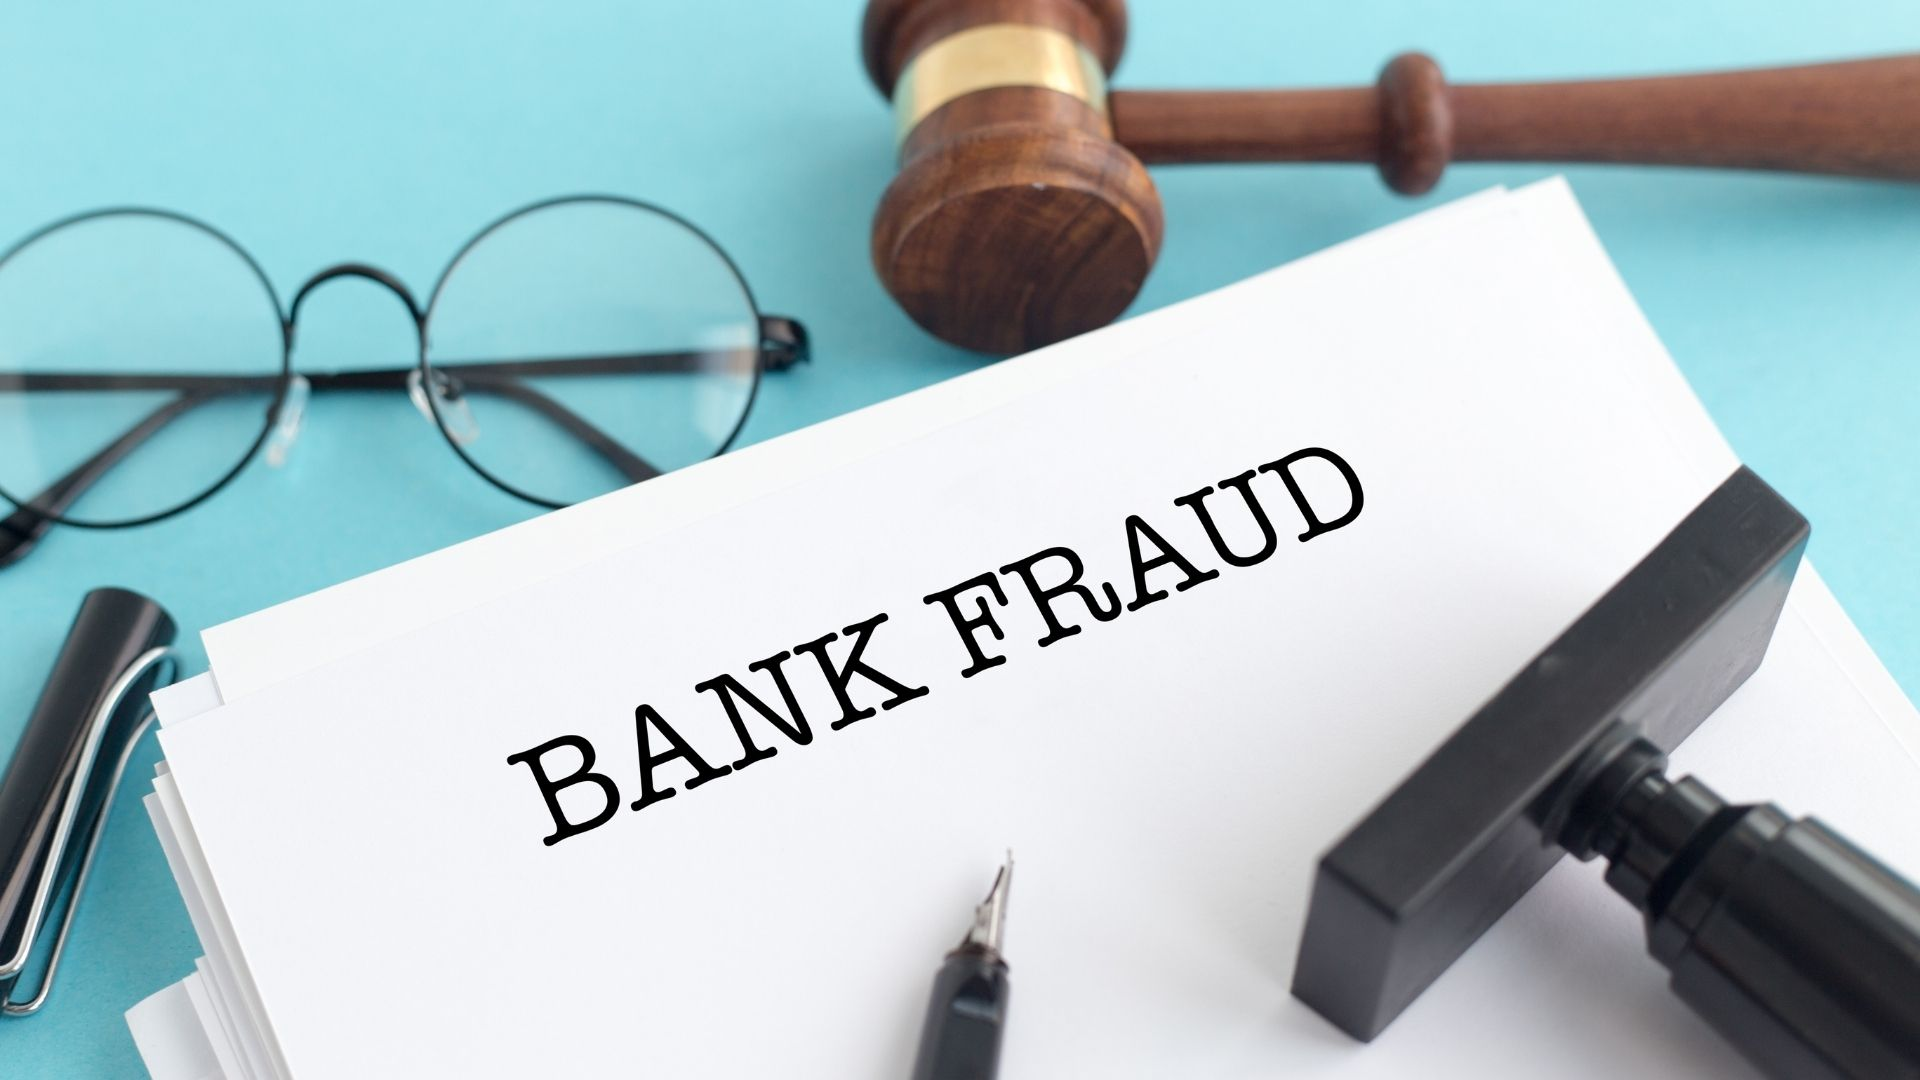 UK banks freeze accounts to reclaim ill-gotten Bounce Back Loans